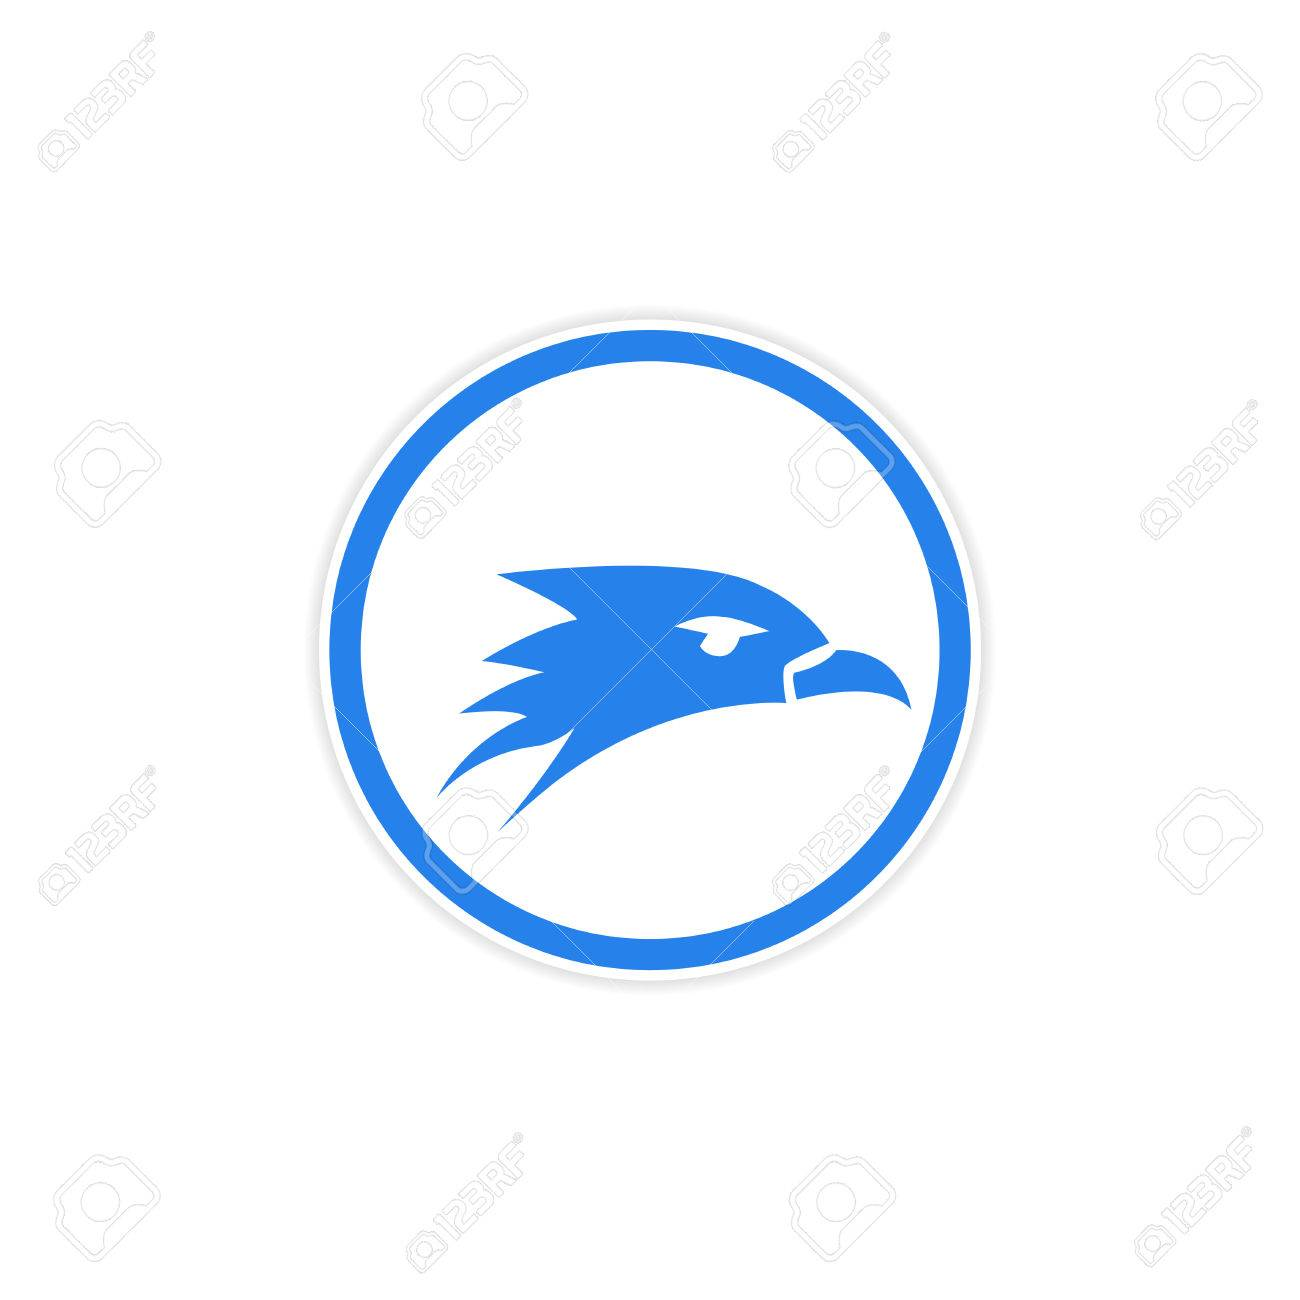 sticker eagle head logo royalty free cliparts vectors and stock rh 123rf com